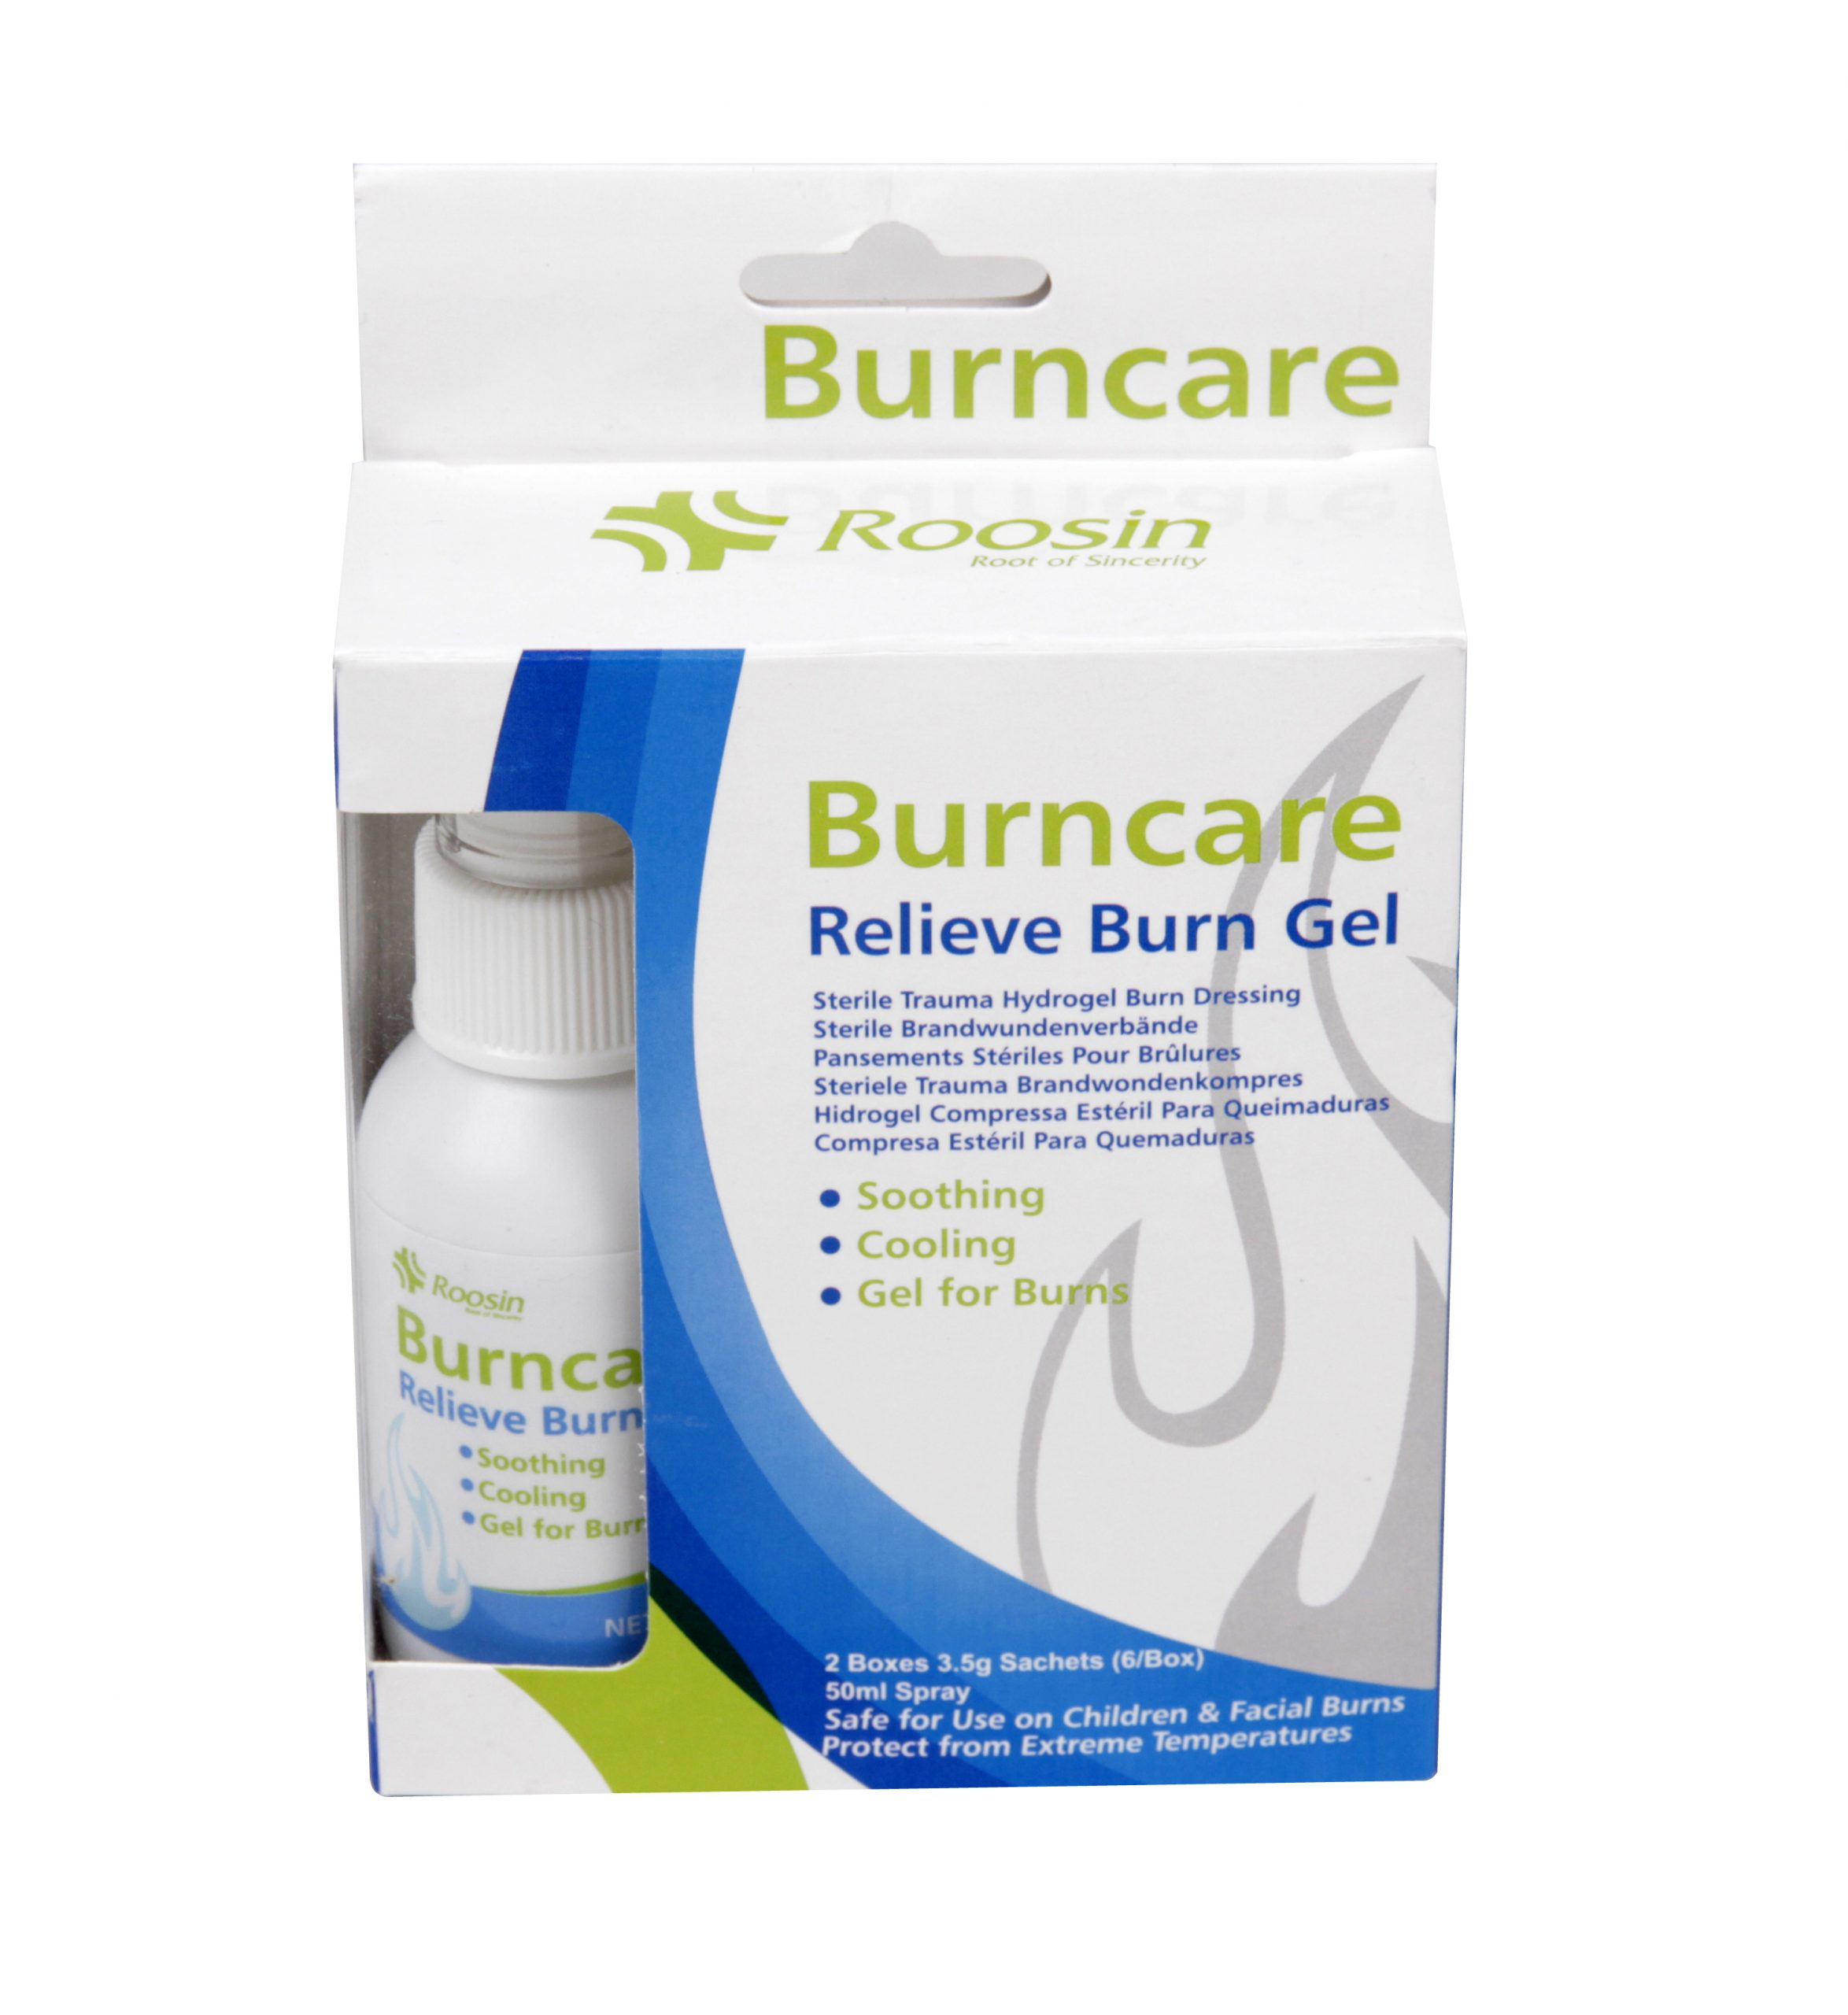 Burncare - Actiekit € 8.67